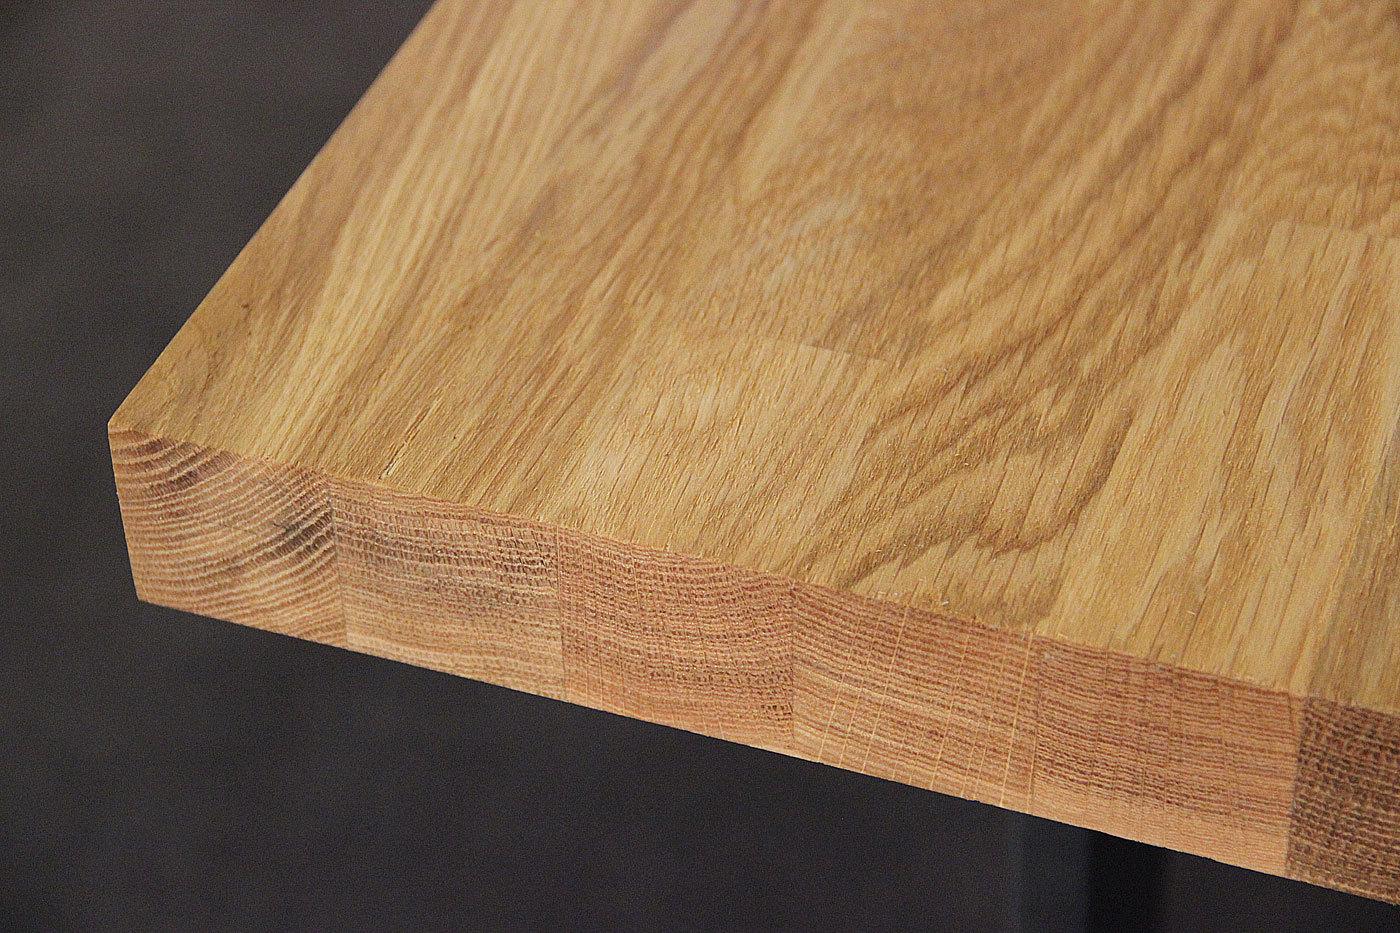 Tischplatte massivholz eiche kgz 40 1800 900 for Tischplatte massivholz